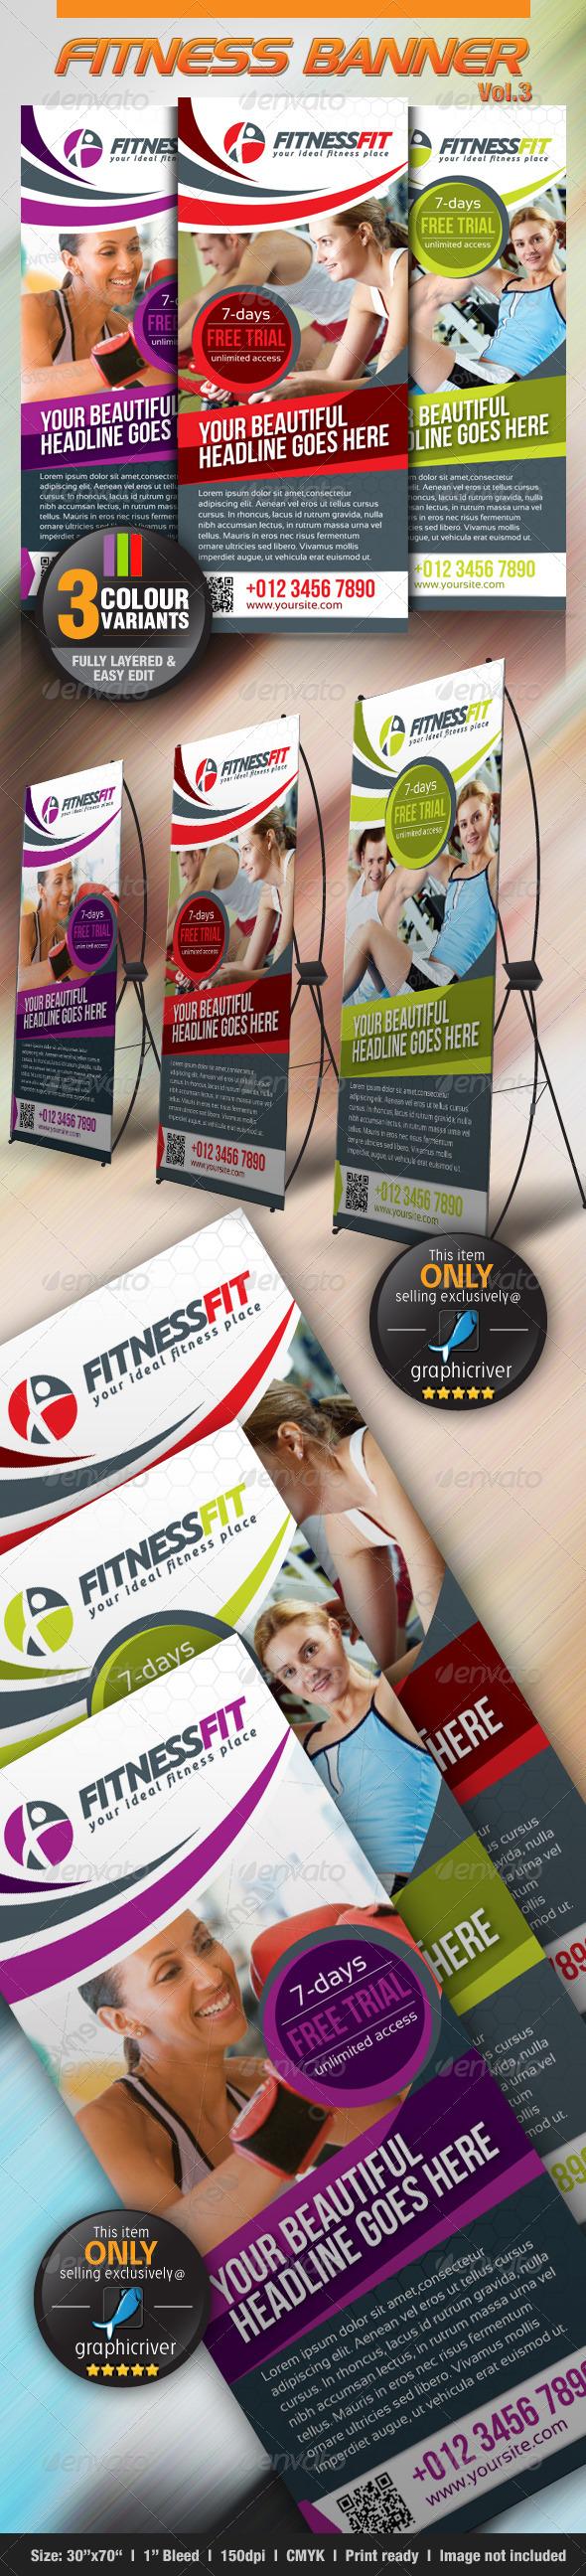 GraphicRiver Fitness Banner Vol.3 3065693